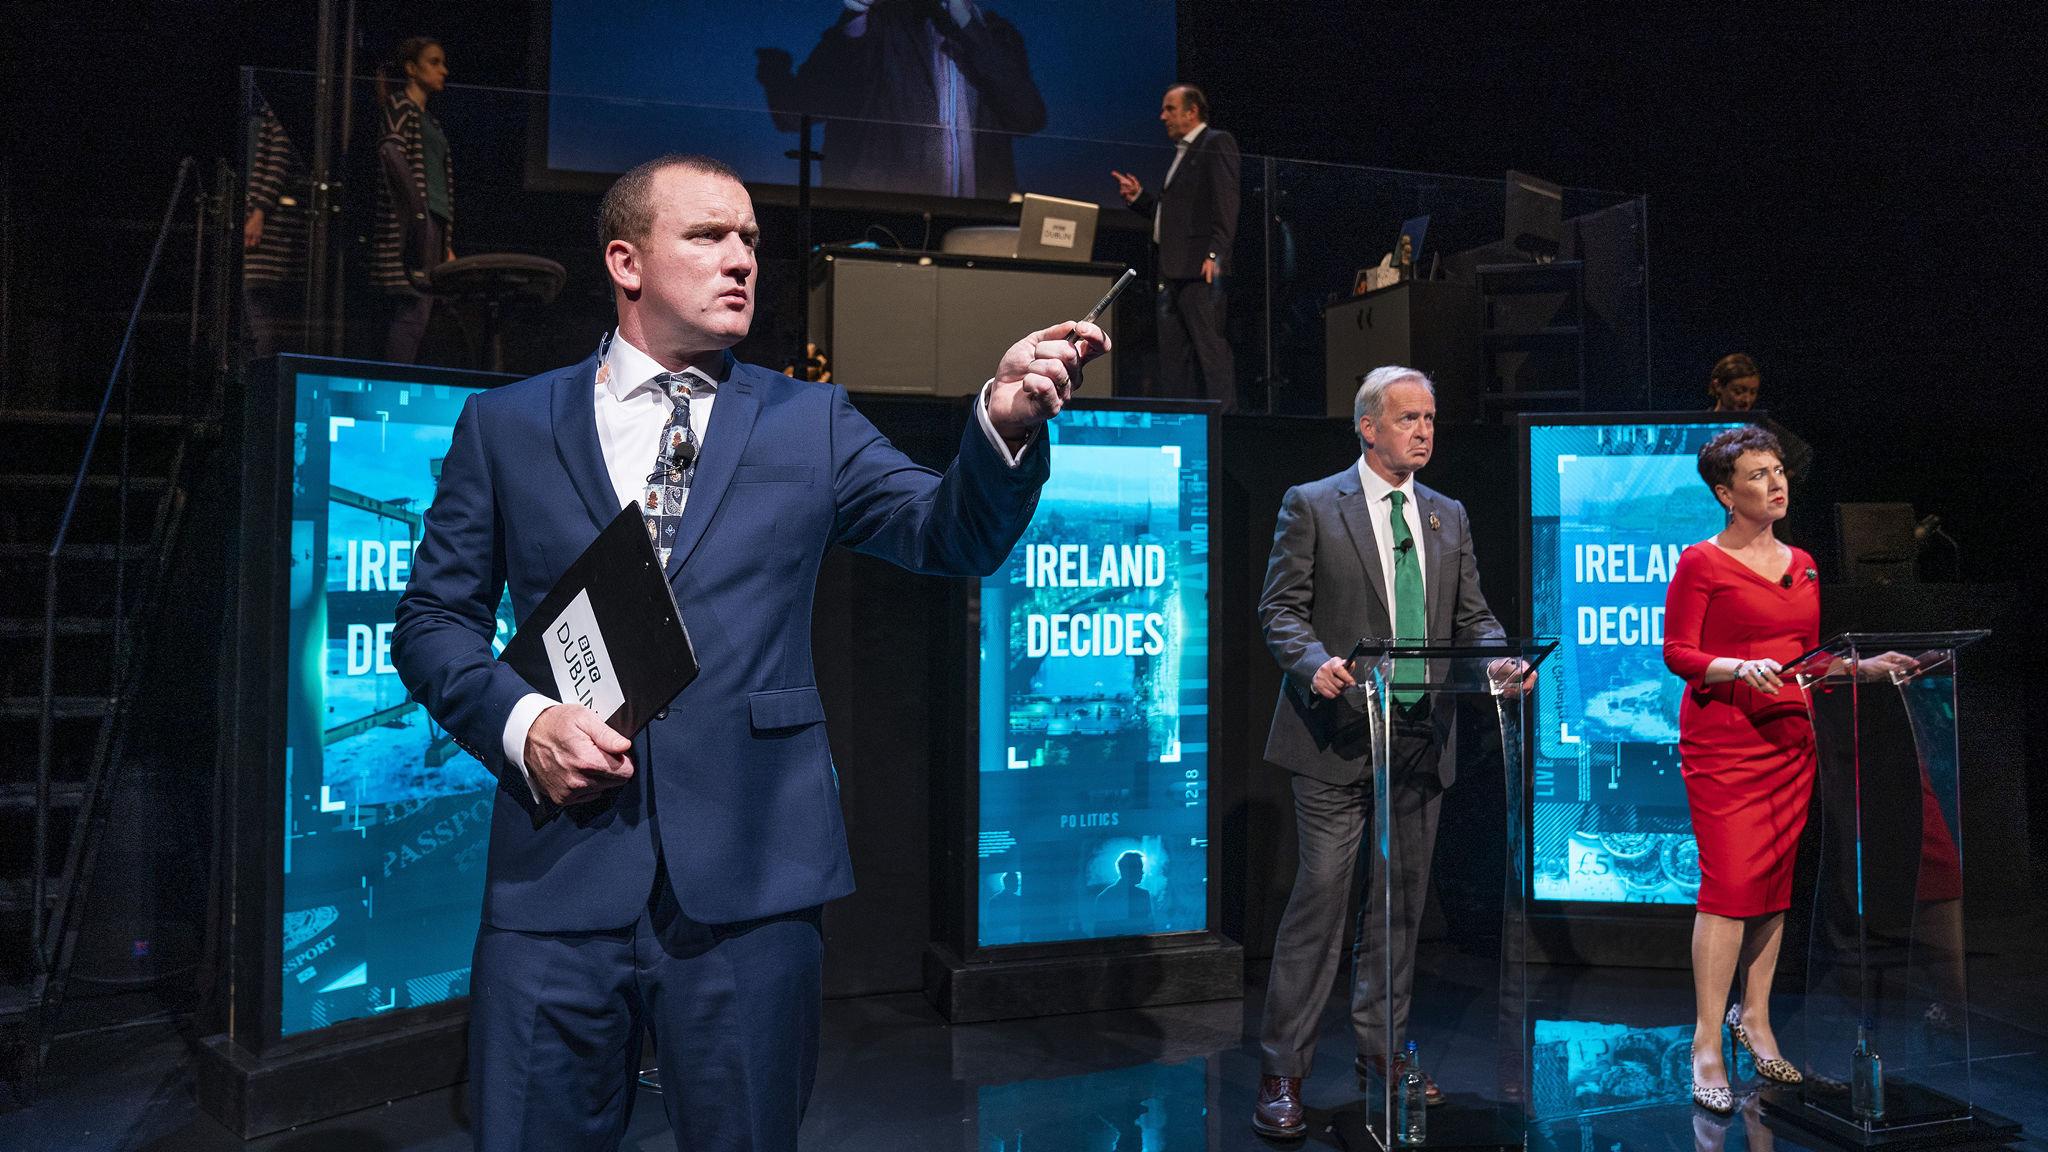 Dublin International Theatre Festival — a conversation with Ireland's past